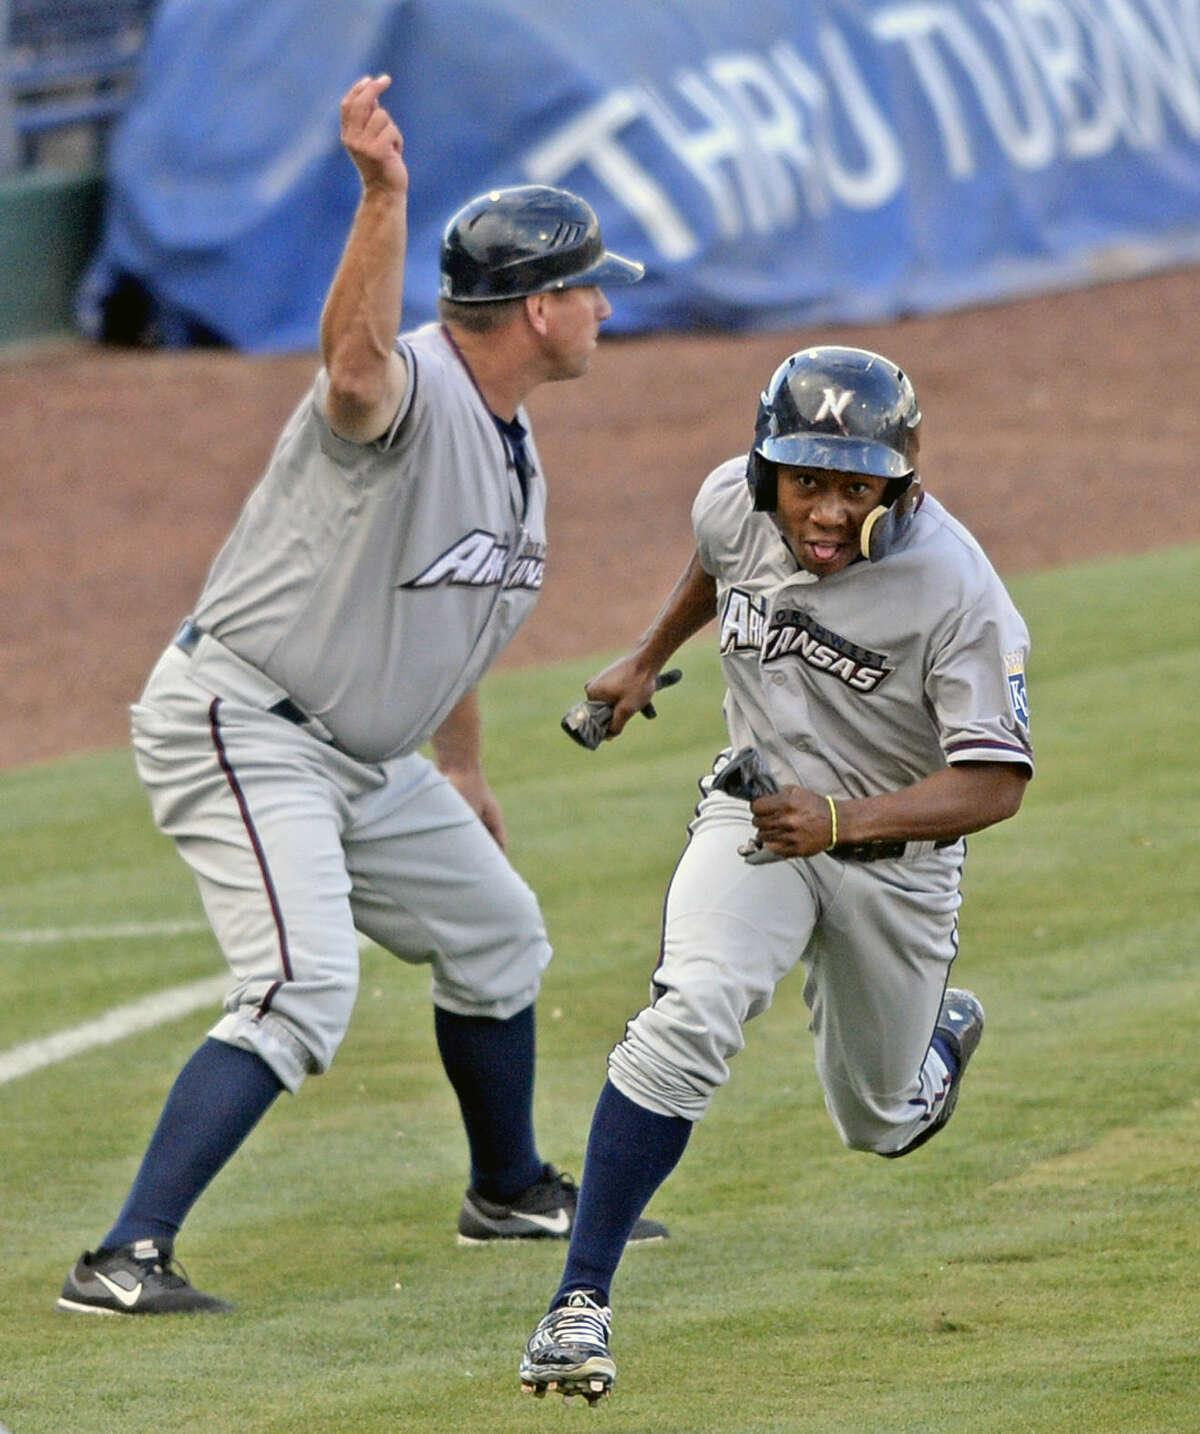 Northwest Arkansas' Terrance Gore scores against the Rockhounds on Tuesday, July 7, 2015, at Security Bank Ballpark. James Durbin/Reporter-Telegram